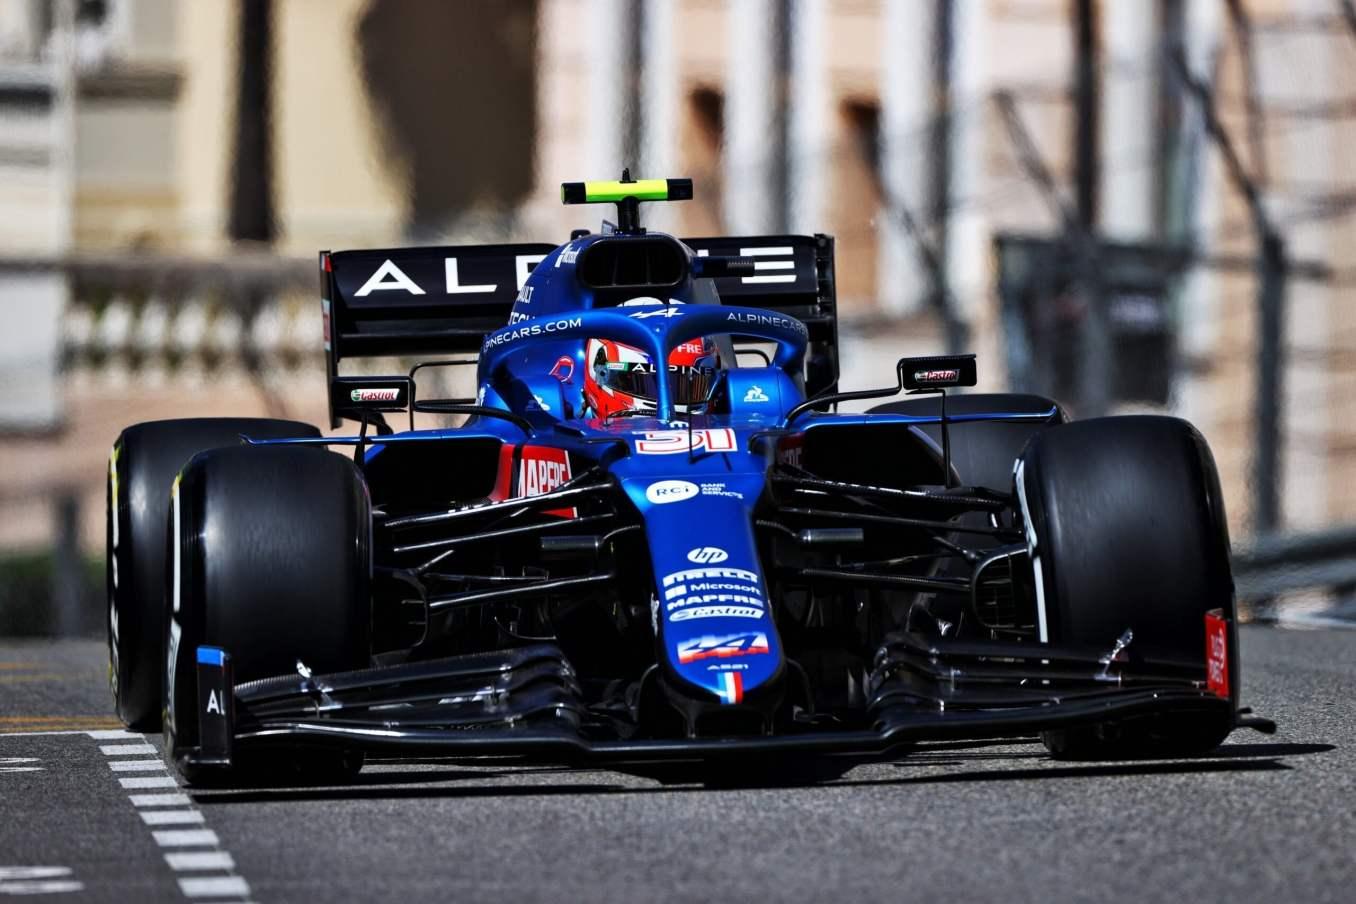 Alpine F1 Qualifications A521 Monaco Alonso Ocon 2021 17 scaled | Alpine F1 n'atteint pas la Q3 à Monaco